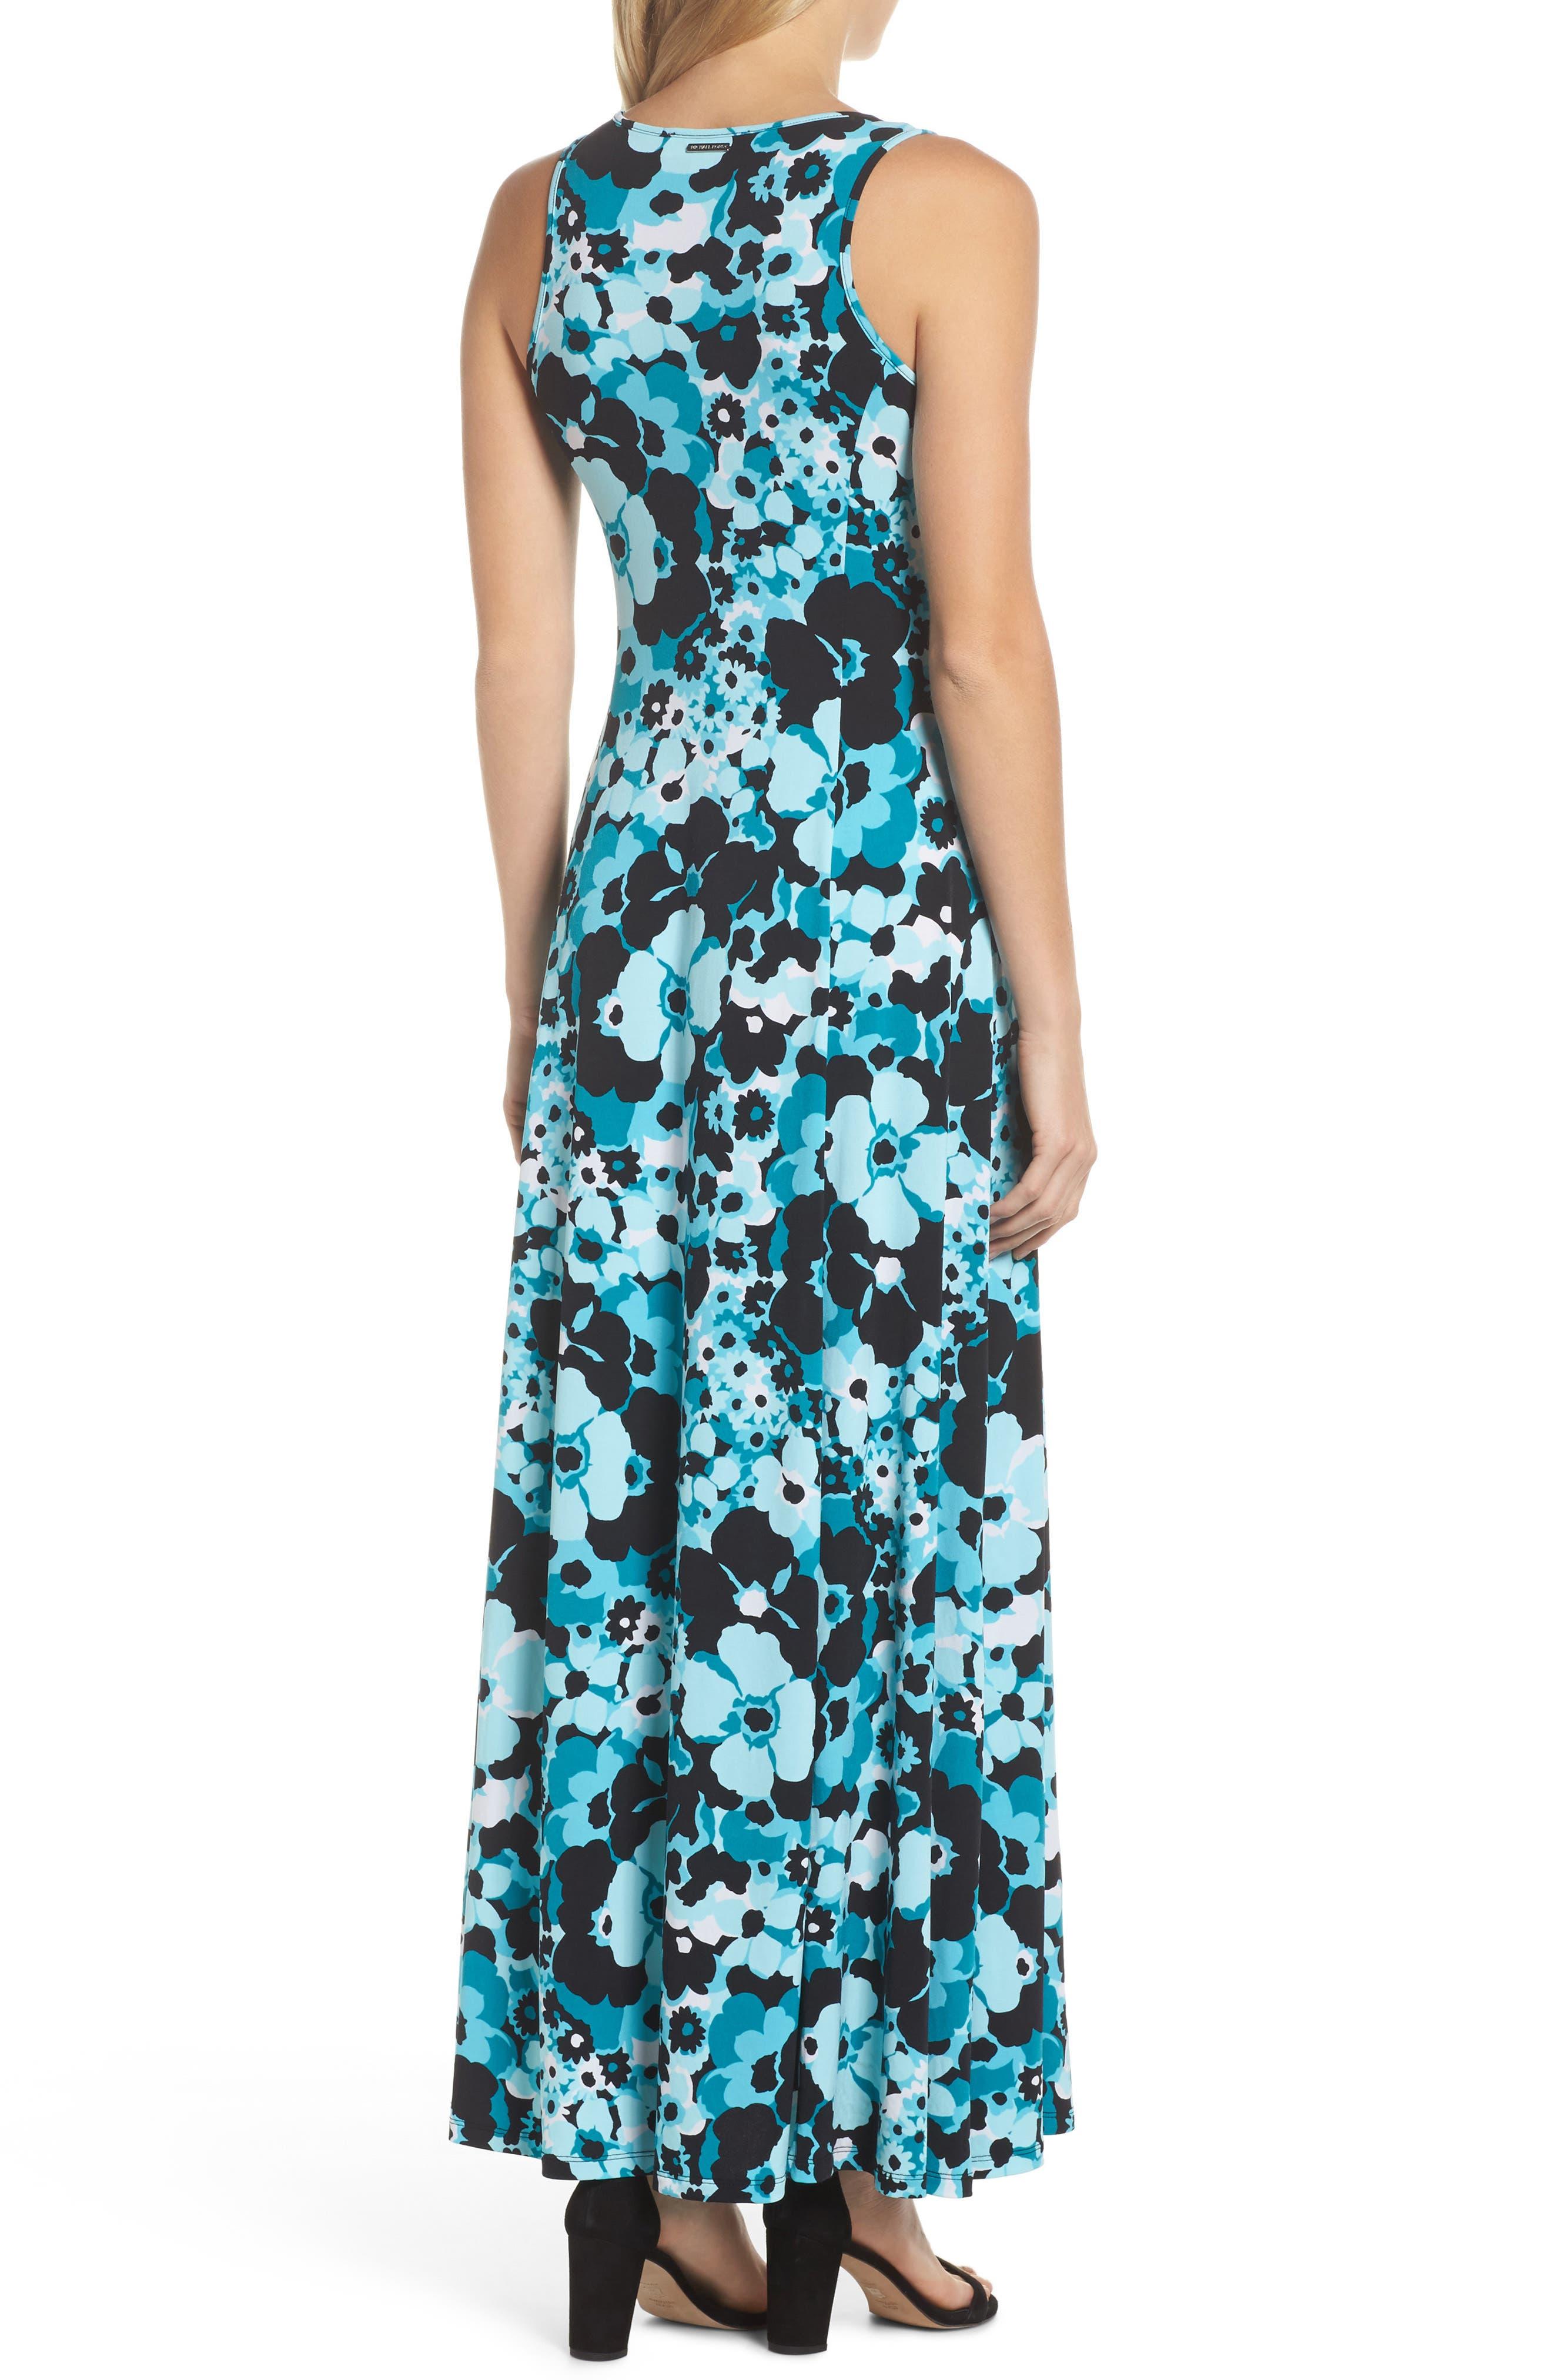 Spring Floral Maxi Dress,                             Alternate thumbnail 2, color,                             494